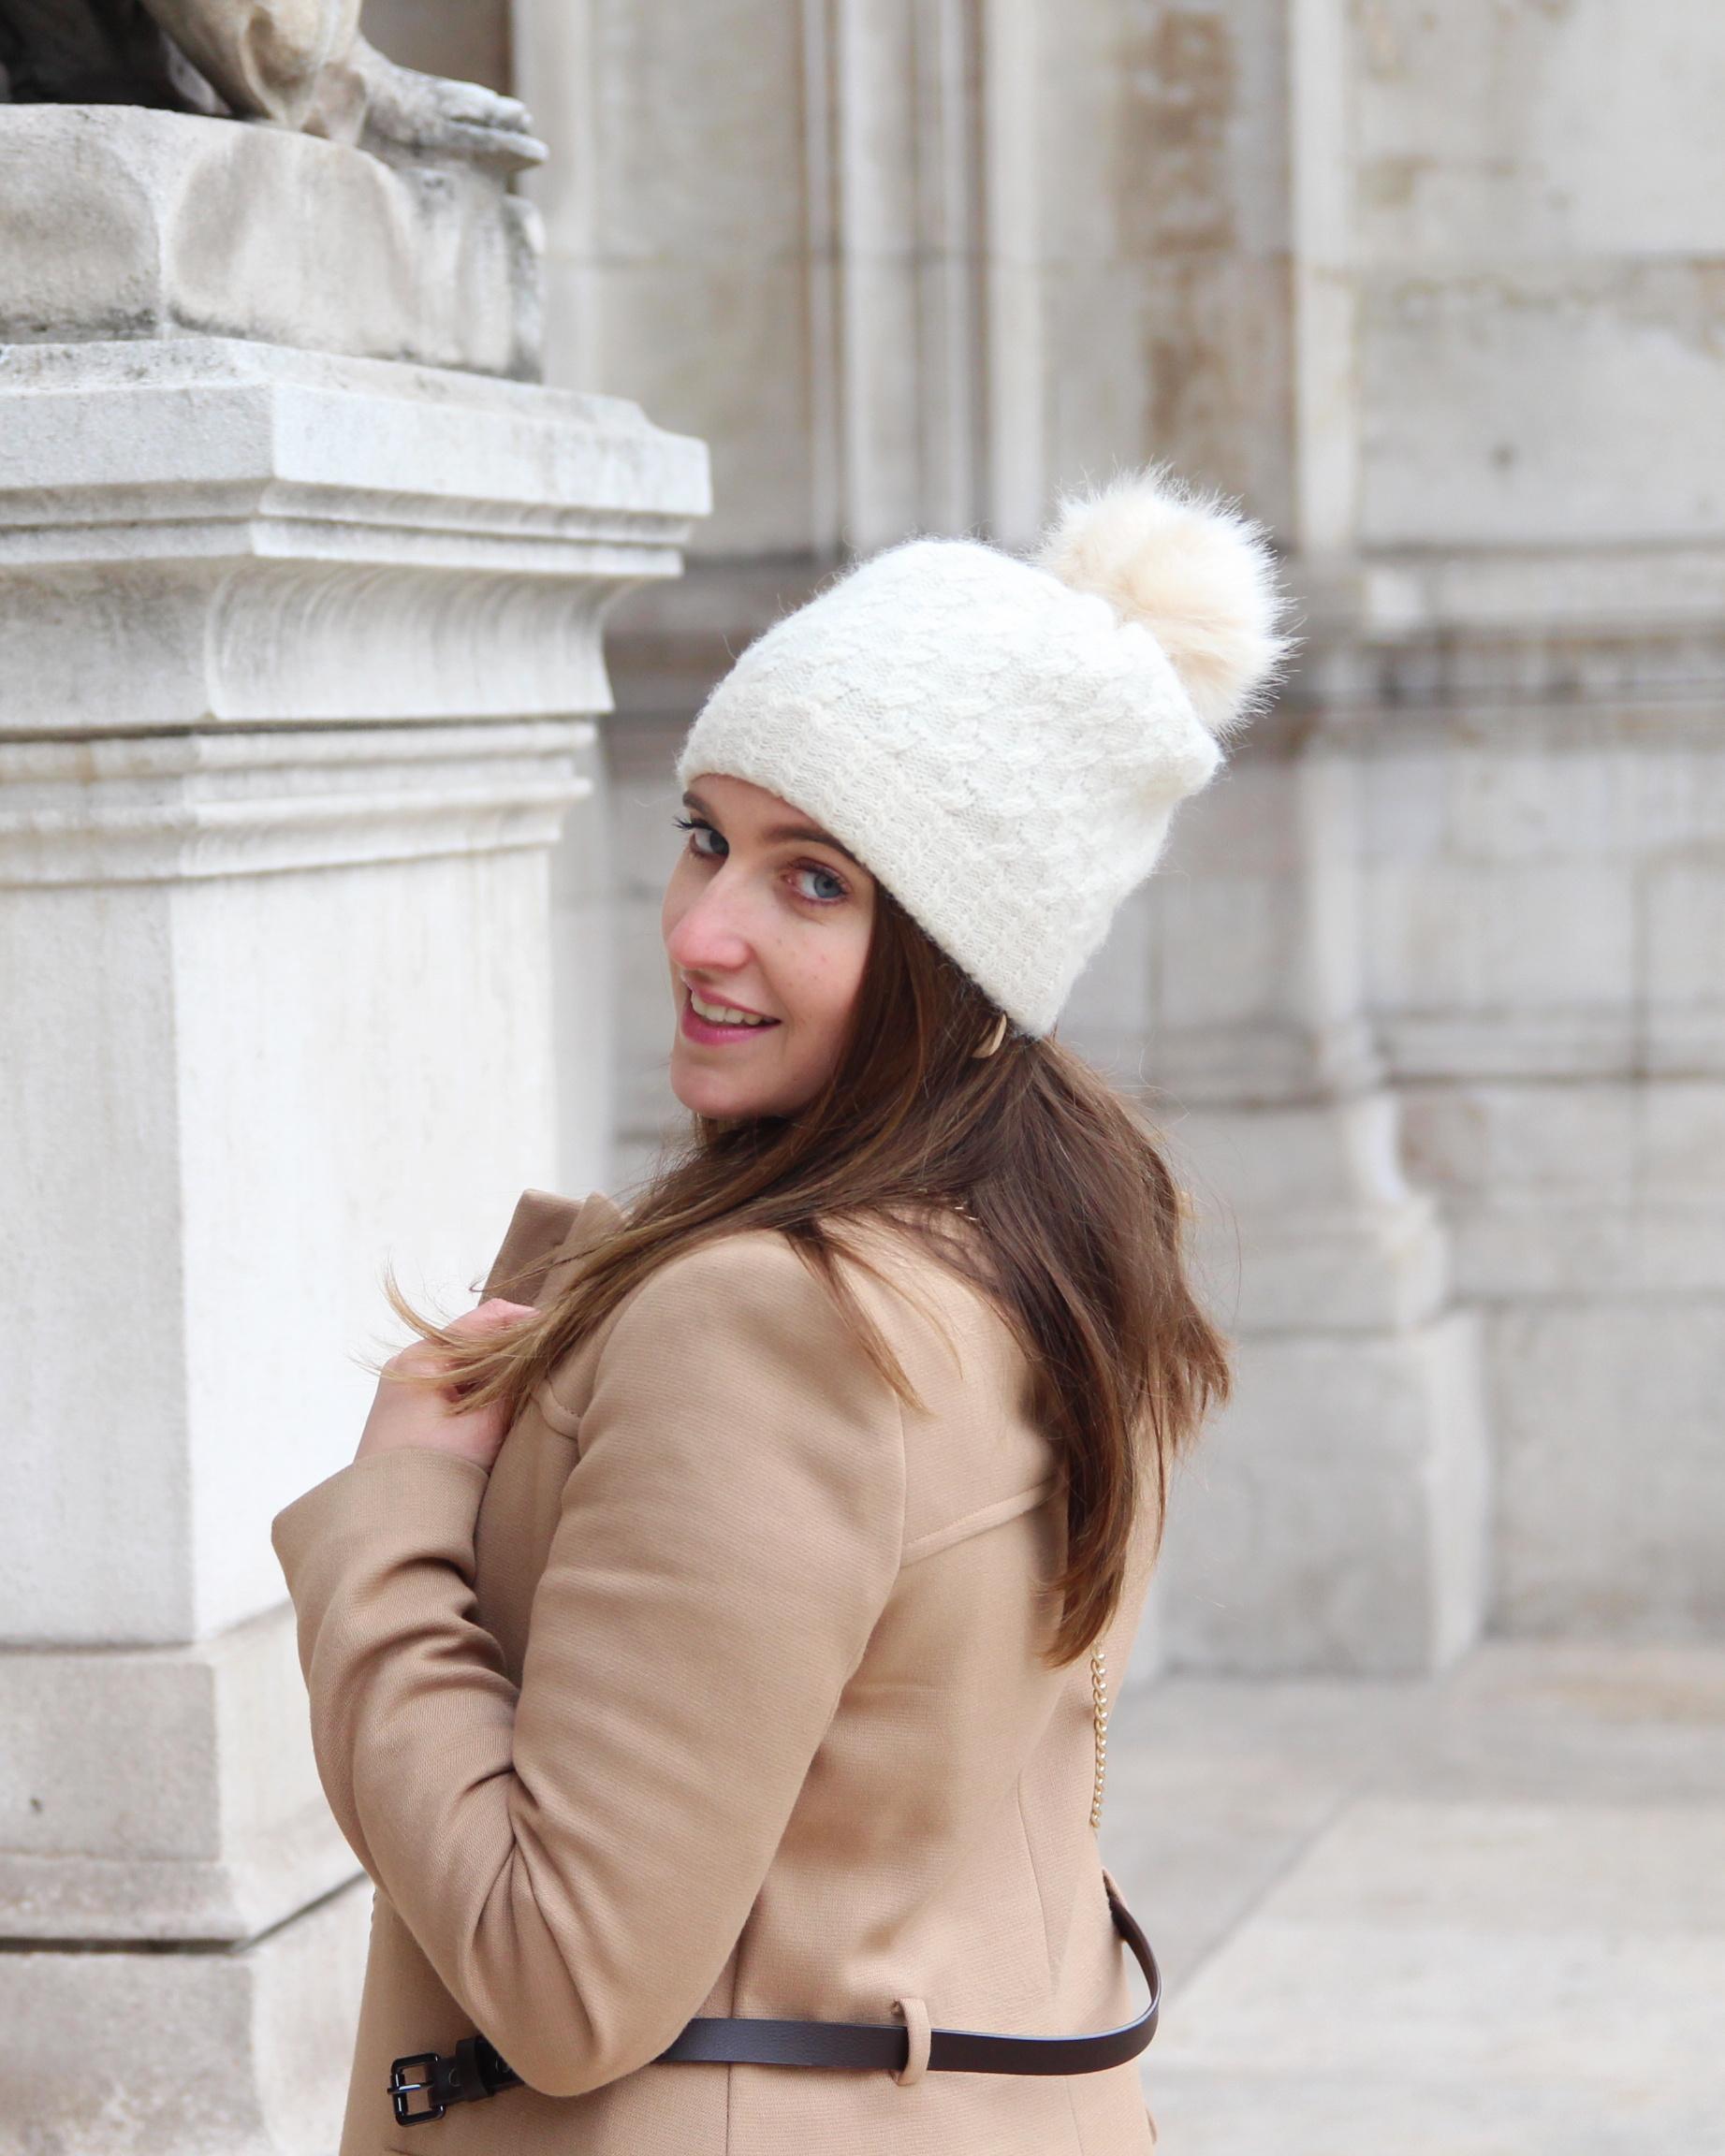 paris-opera-garnier-winter-day-influencer-style-personalstylist-imageconsultant-seralynepointcom-img_6630